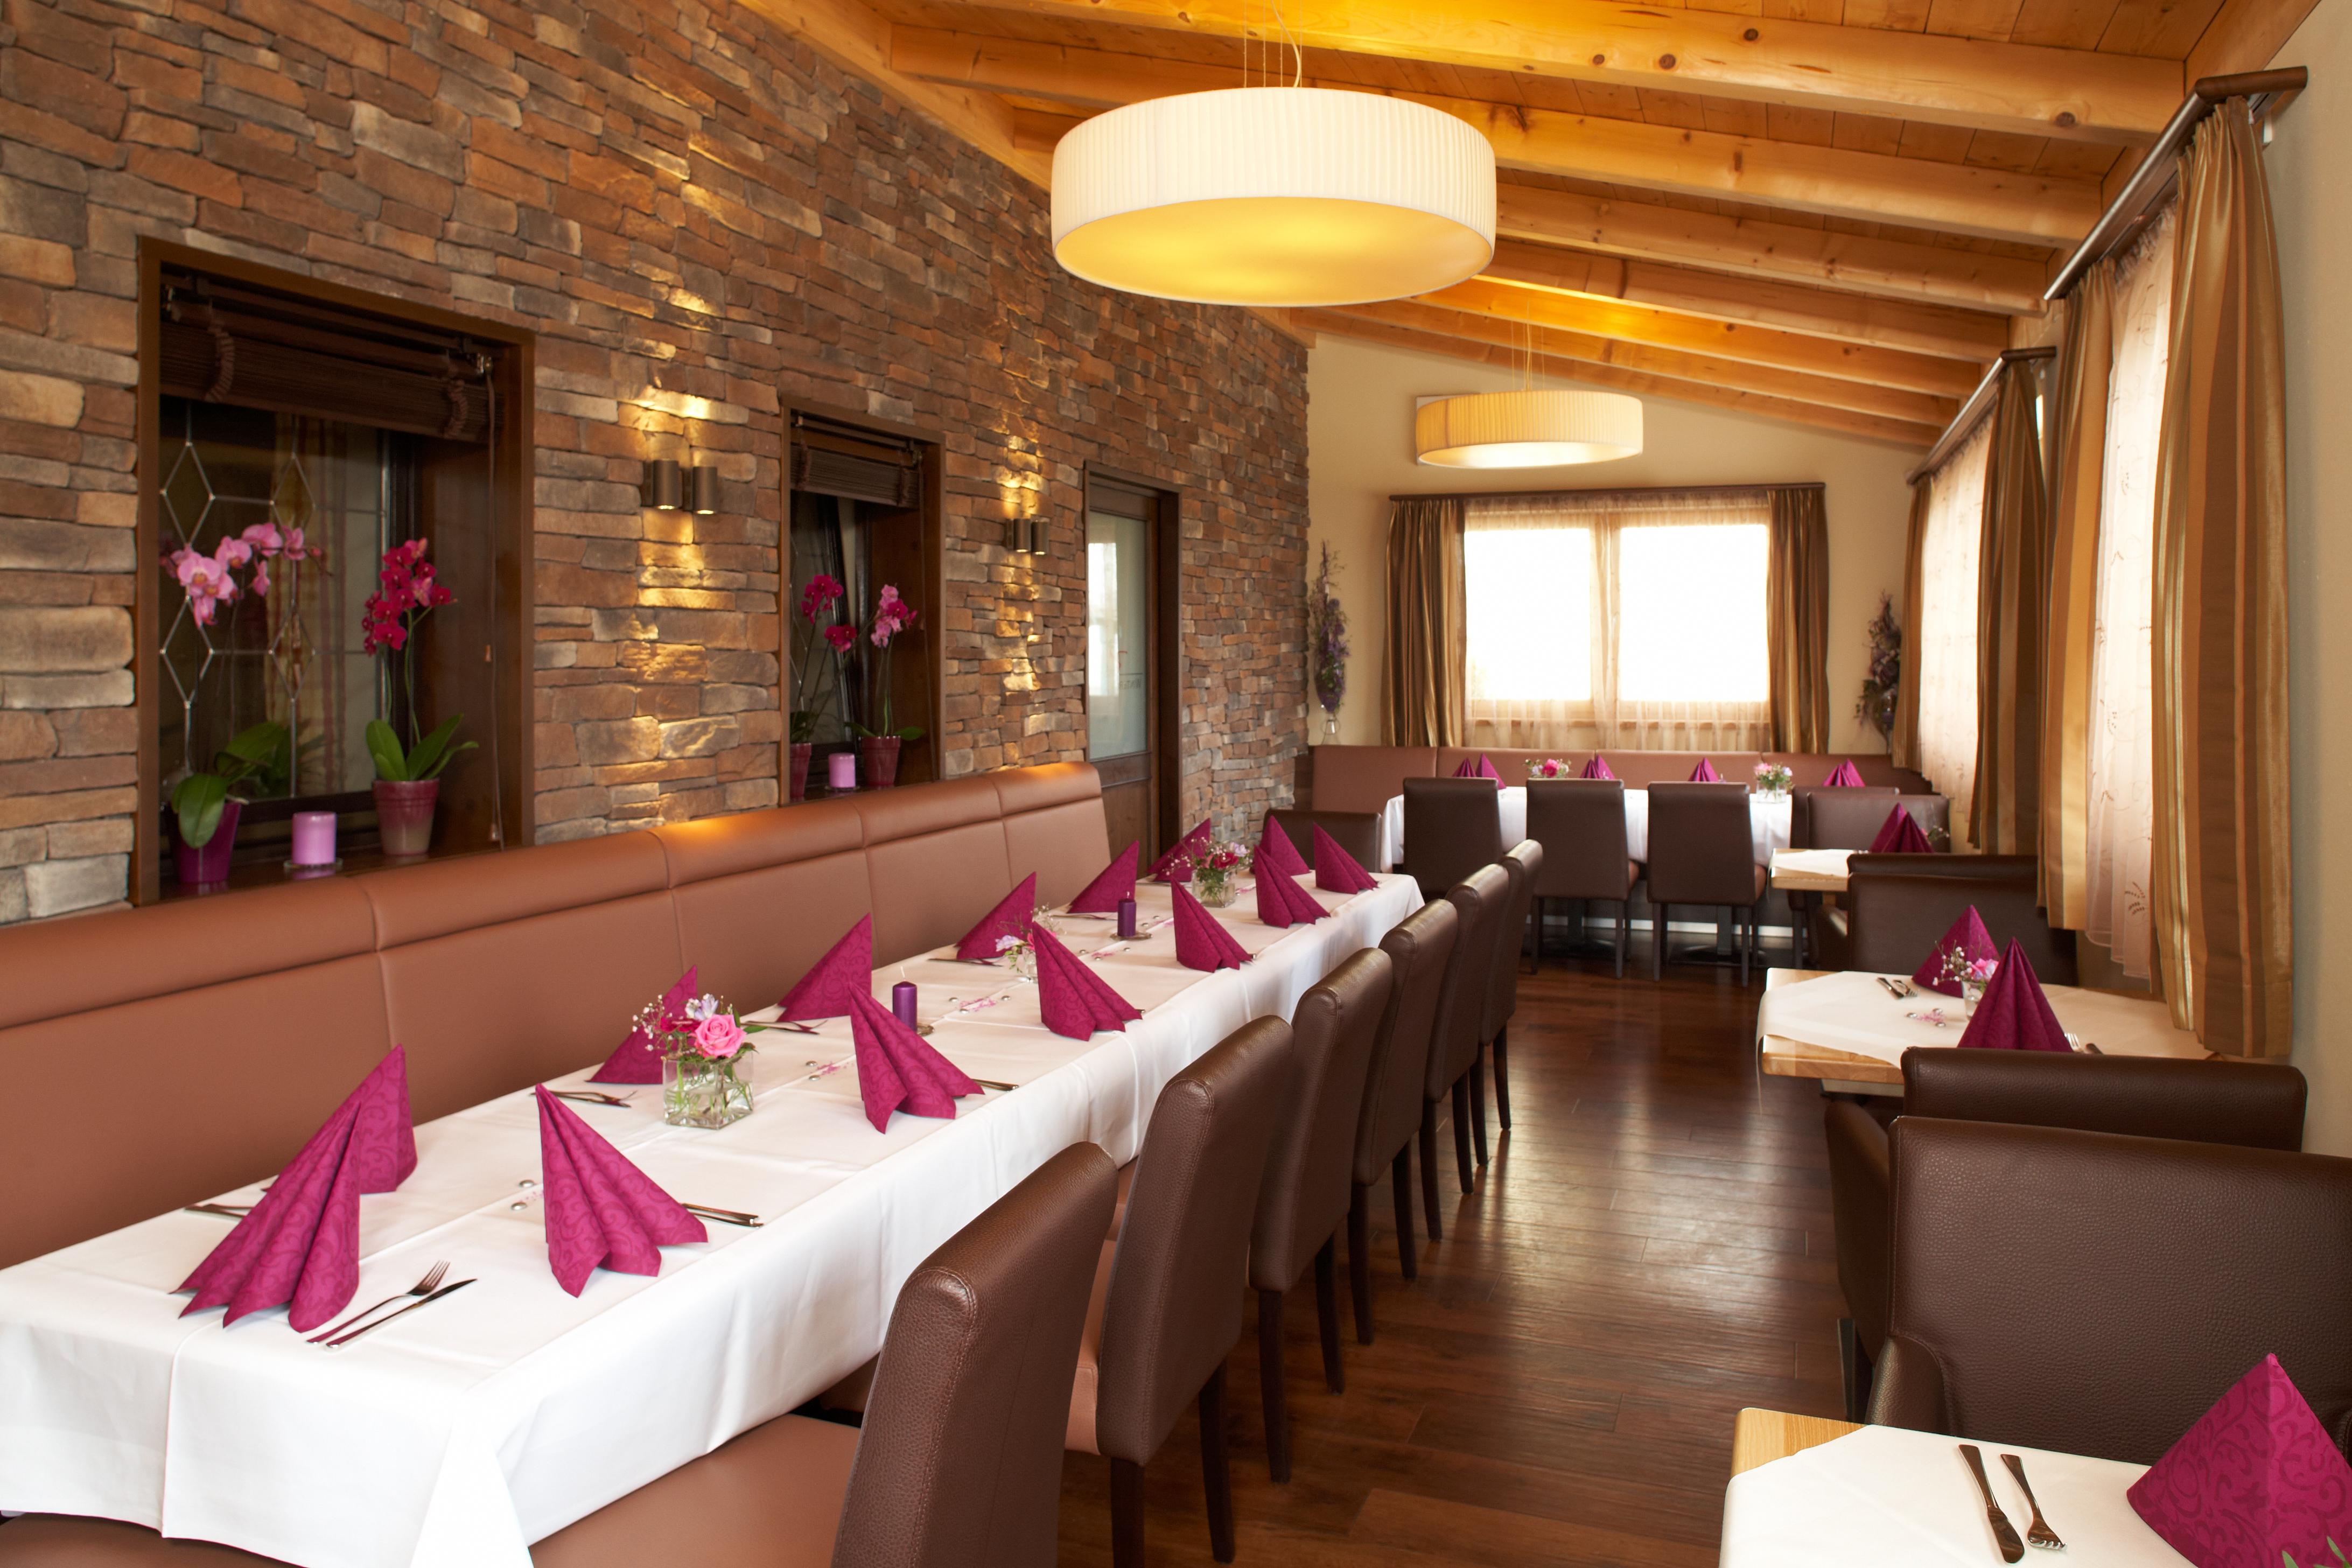 Servus im Hotel Traumschmiede in Oberbayern! - Hotel Traumschmiede